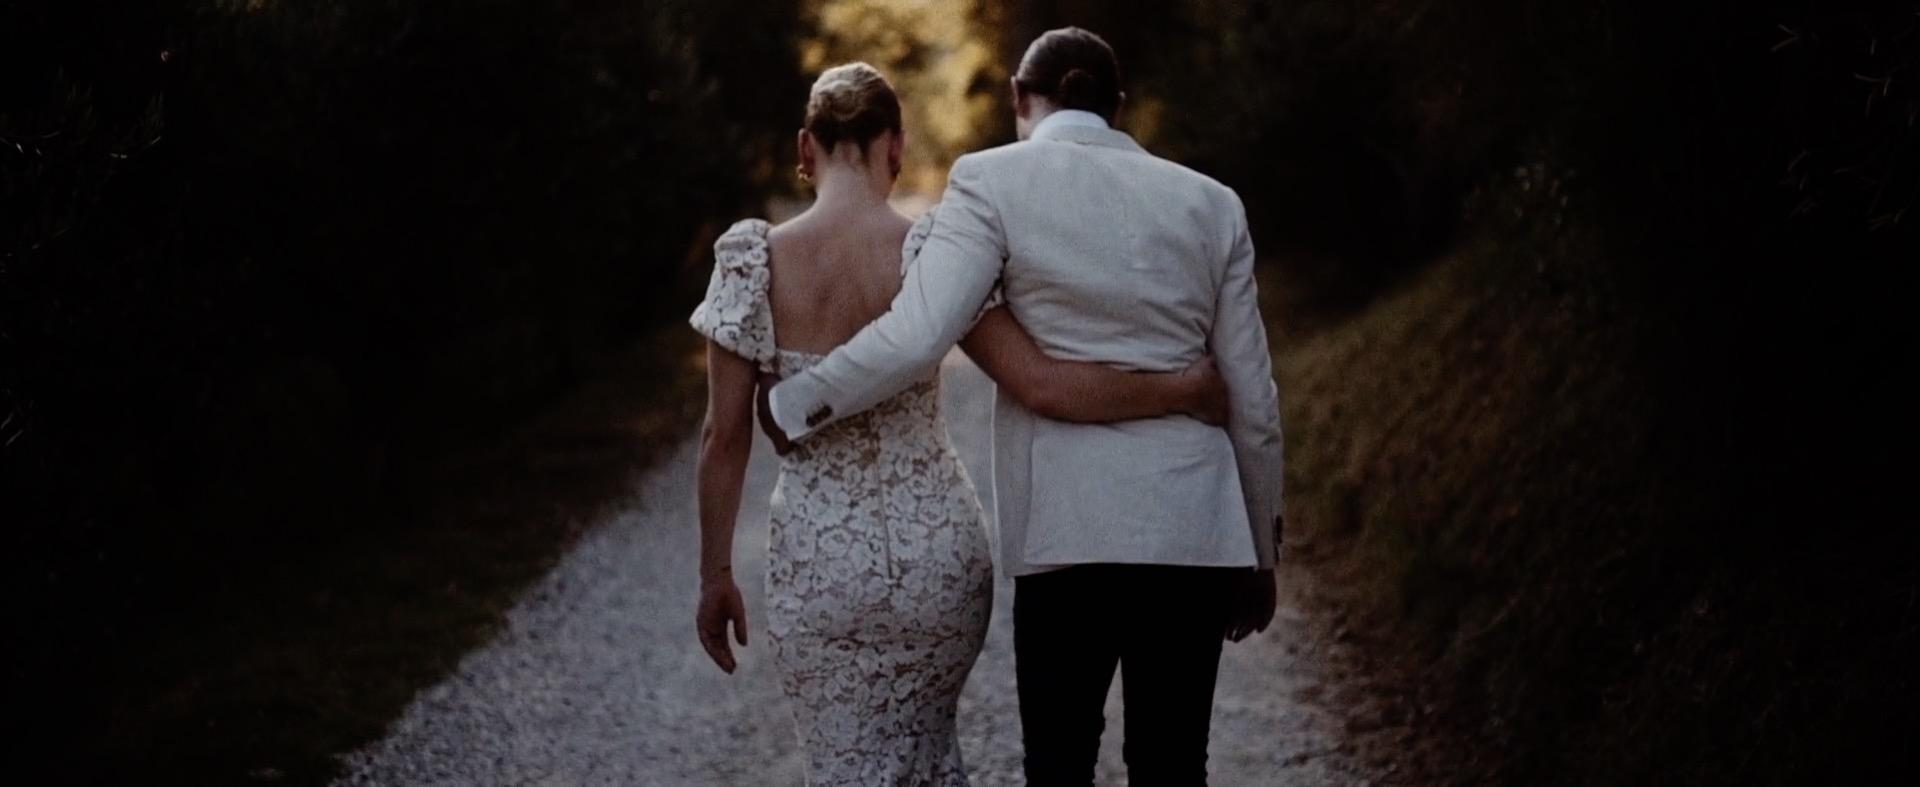 Destination Wedding, emanuele Mura, Wedding Videographer ilaly, wedding, venues, wedding video, best videography